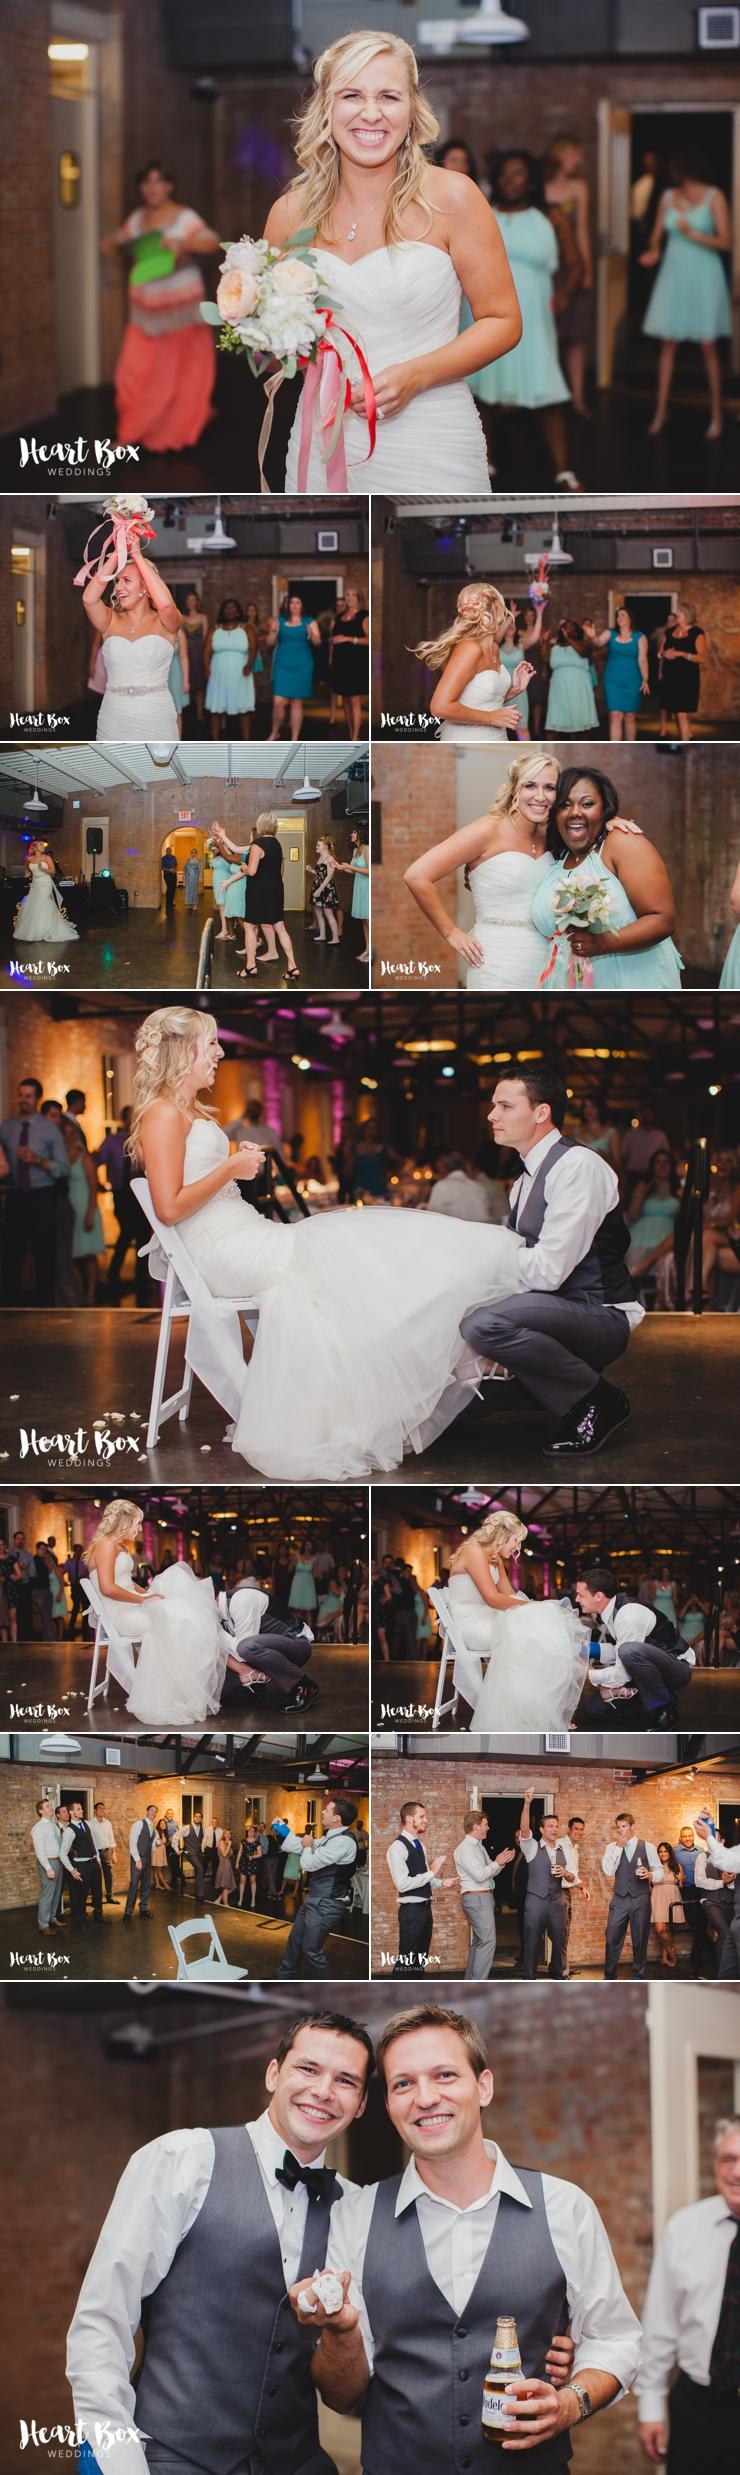 Gould Wedding Blog Collages 22.jpg